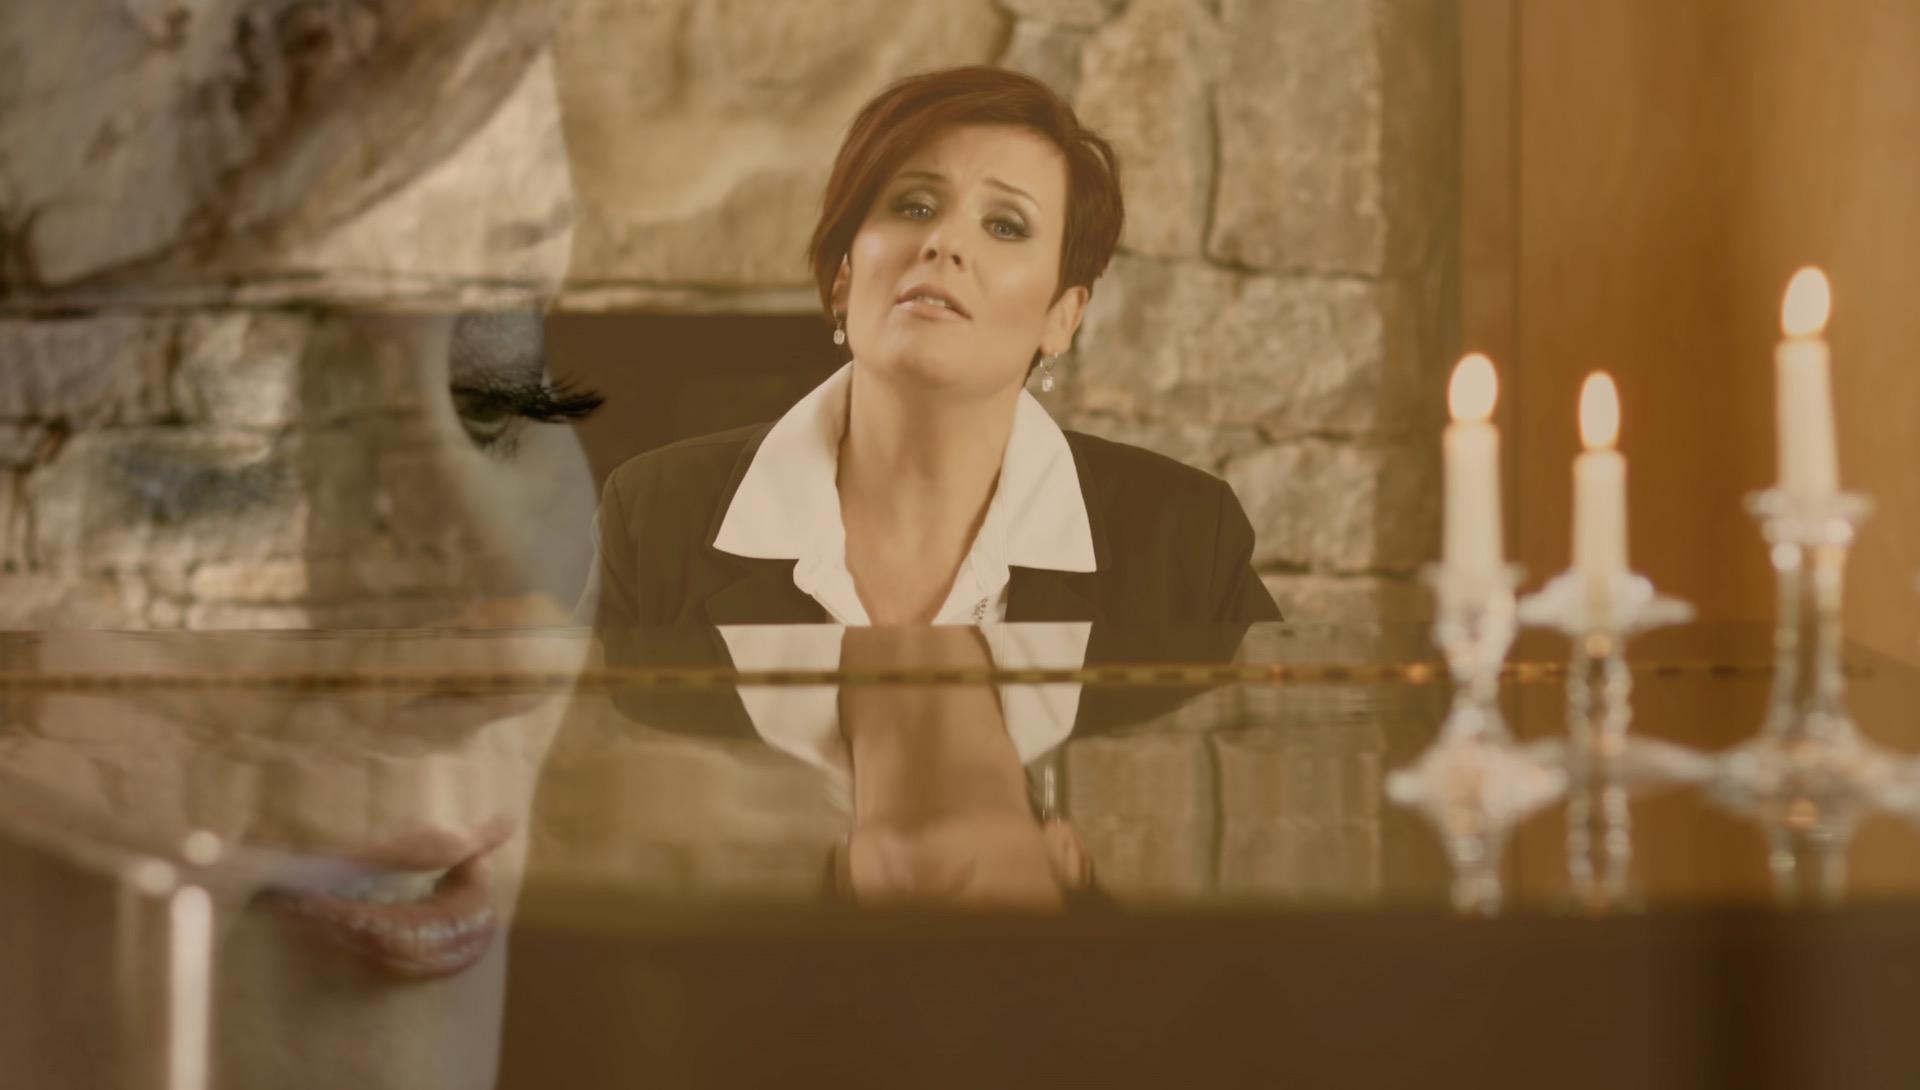 Karin-music-video-Screenshot 2015-11-08 08.03.42.jpg